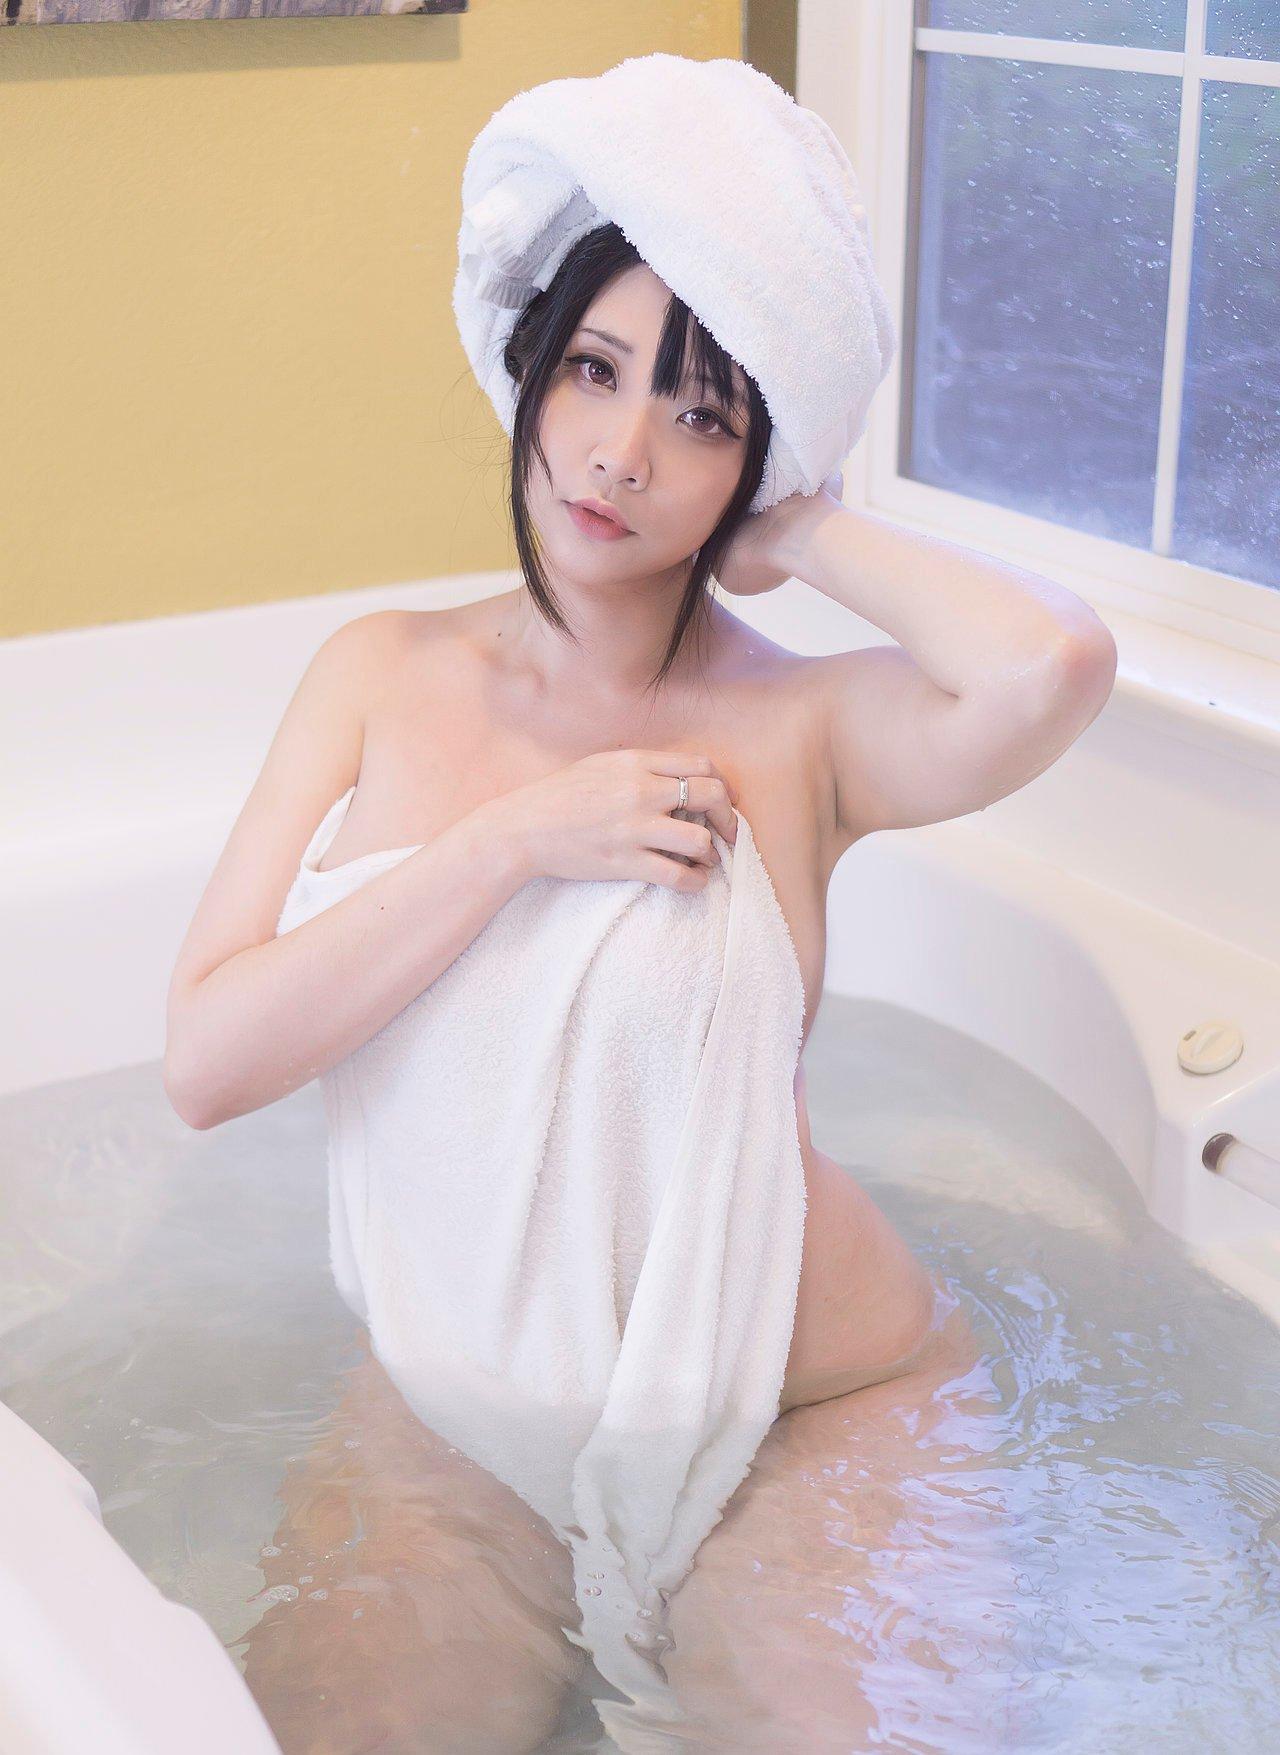 Audrey Bathtub Bunny Twitter Sexy Leaks 0005